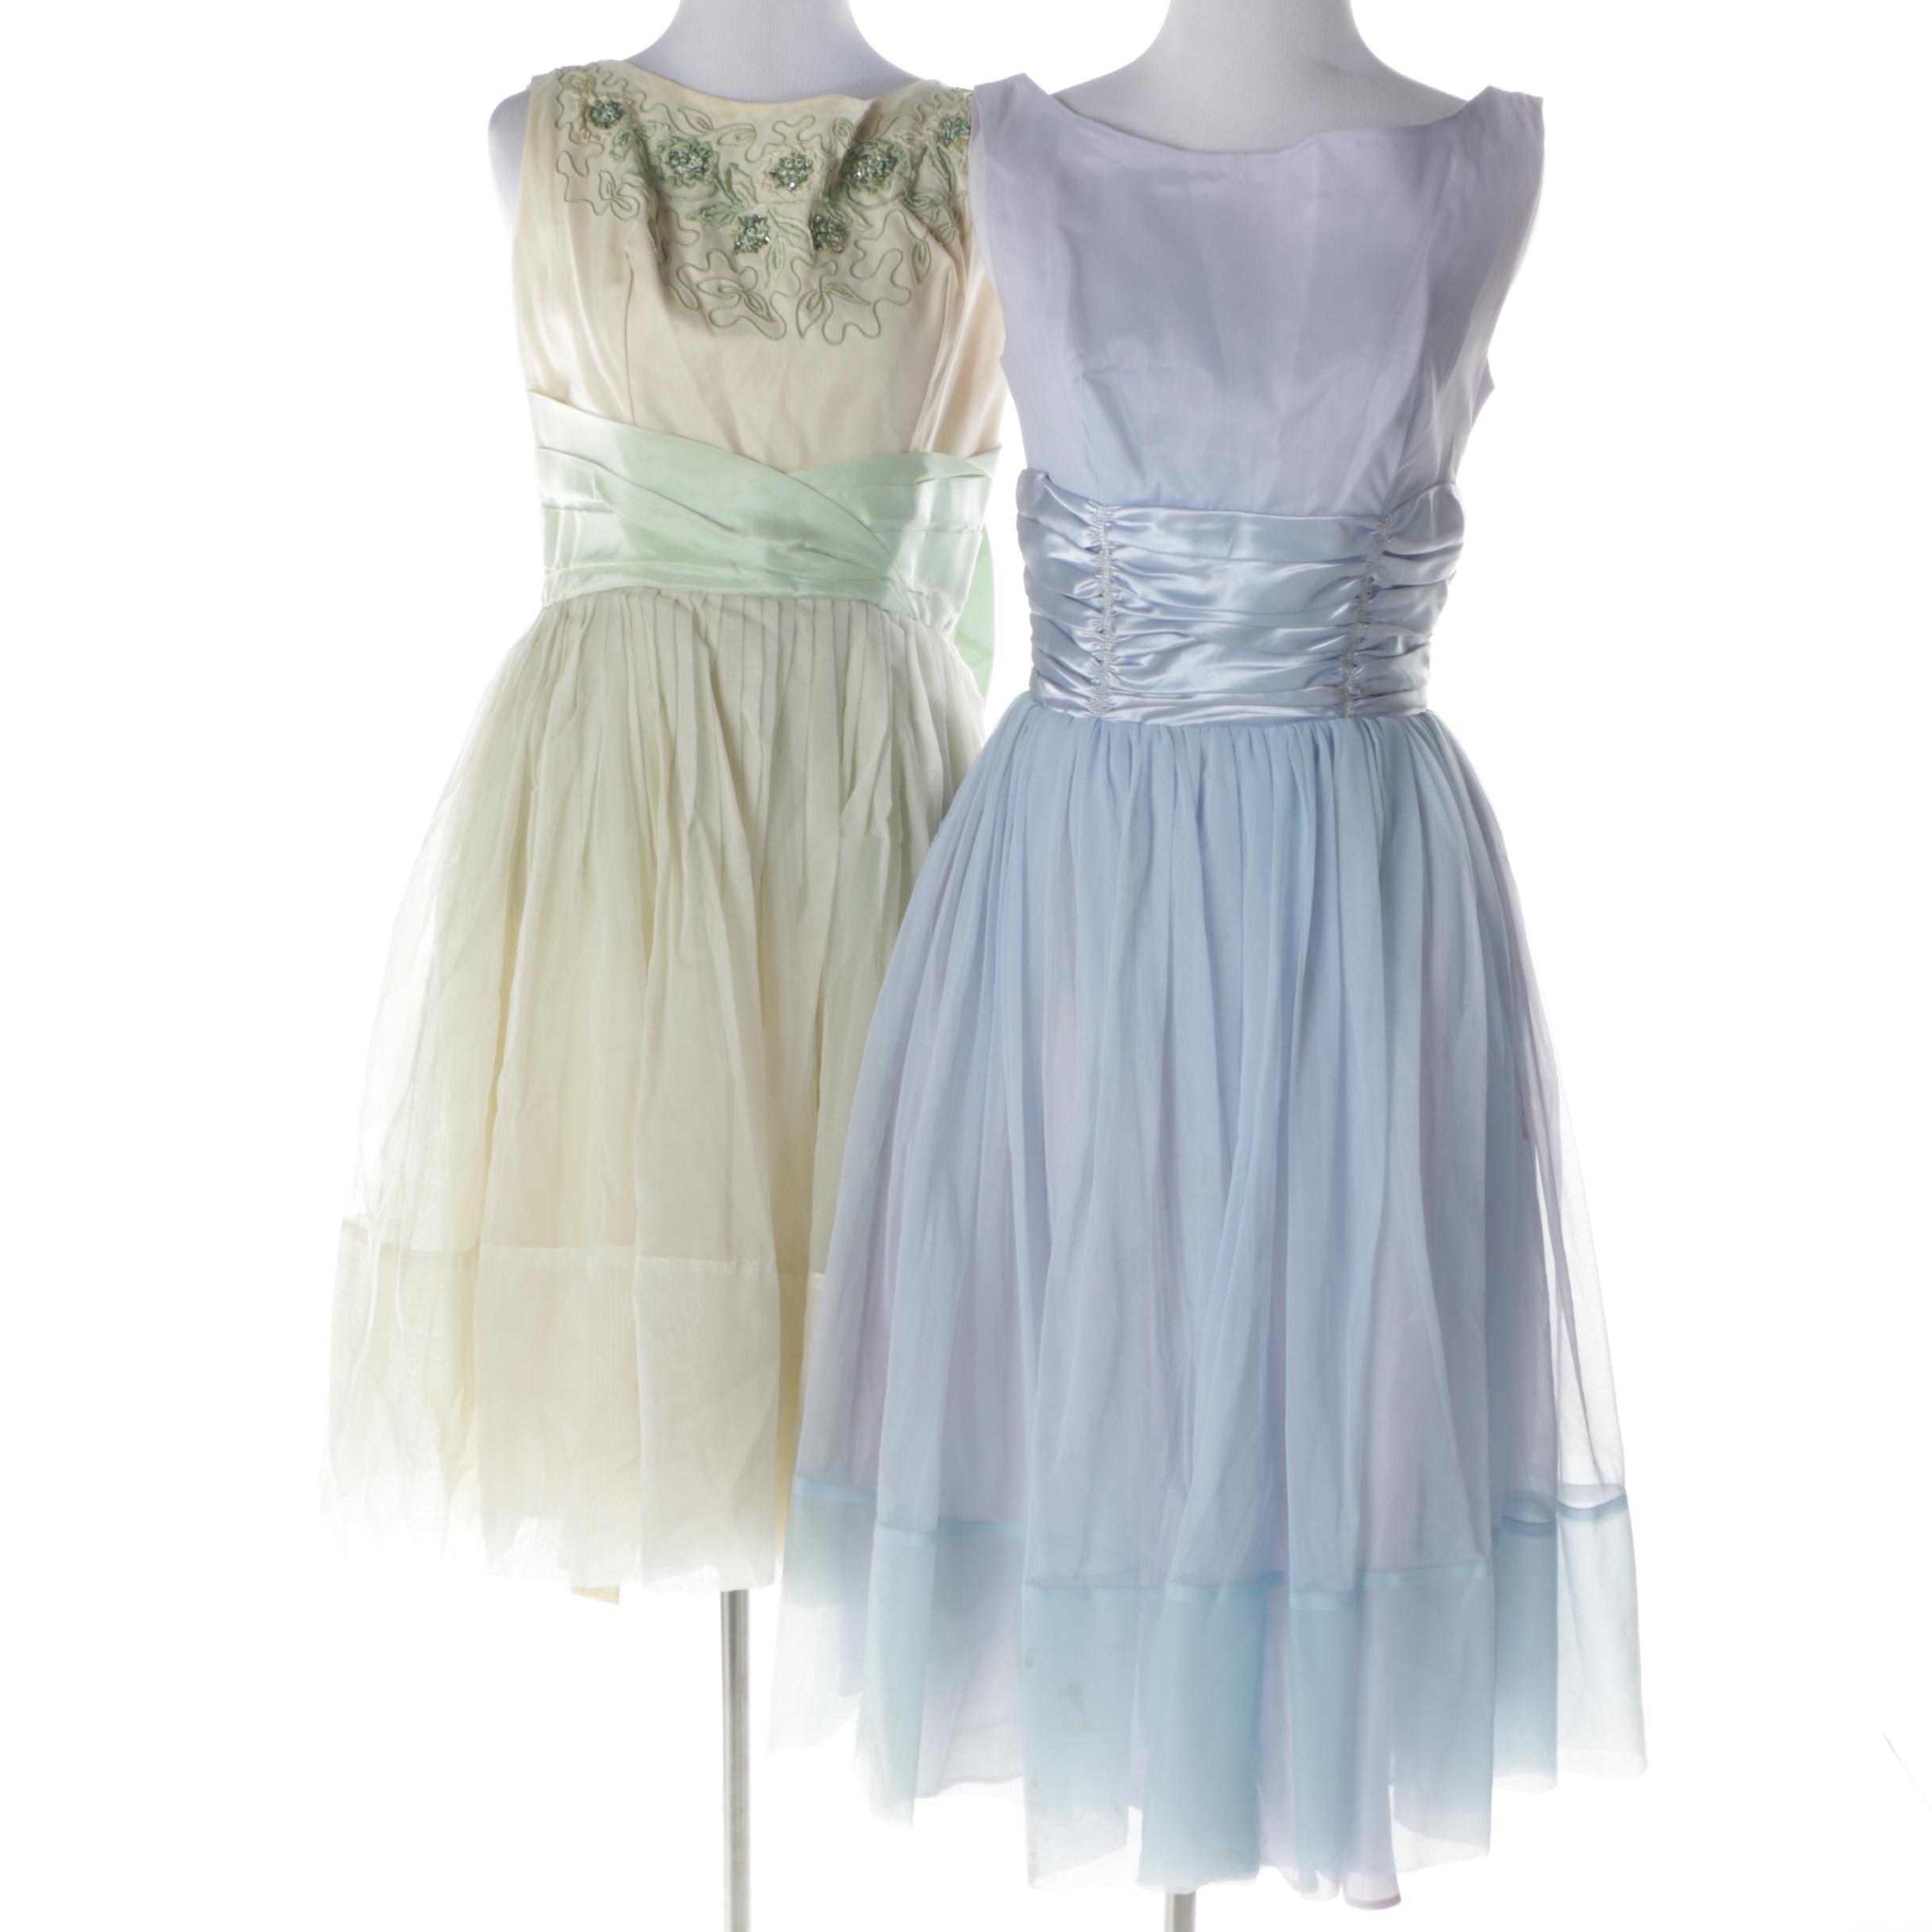 Circa 1950s Vintage Formal Dresses